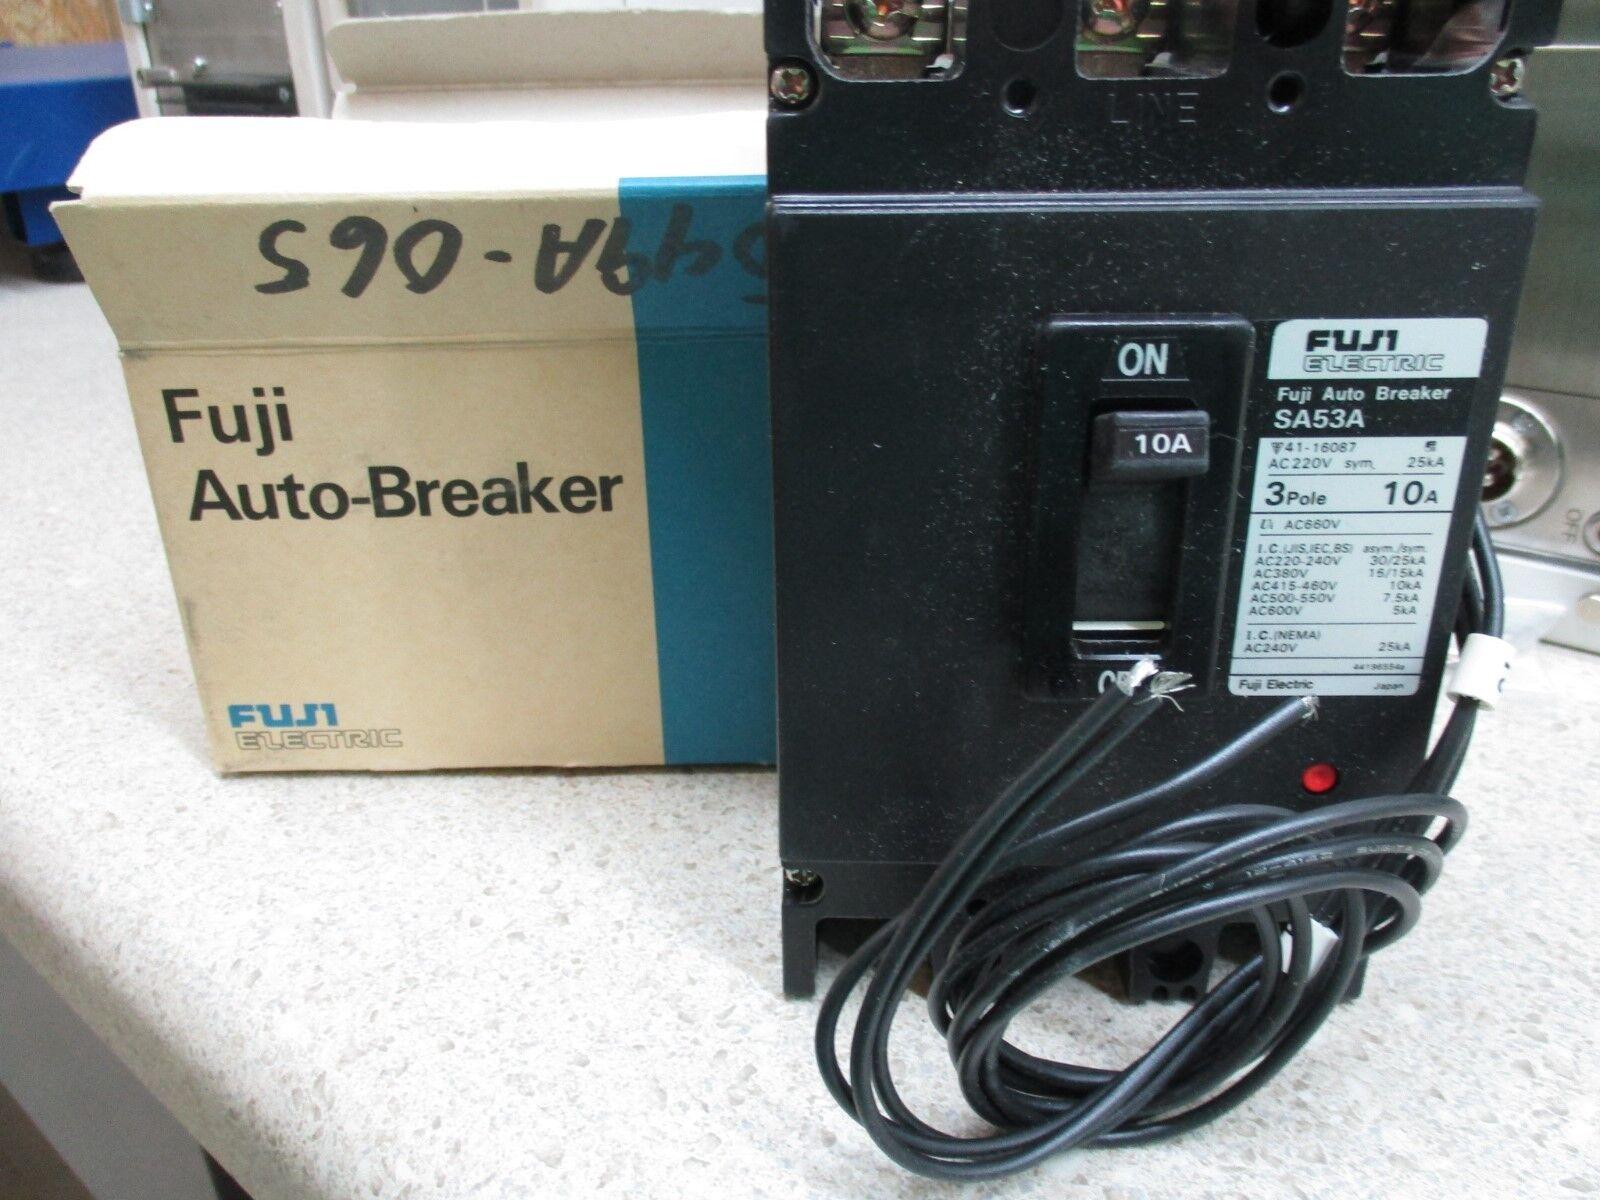 Pleasing Fuji Electric Auto Breaker Sa53A 3P Trips M Nib 10A Nrhfen2379 Wiring Cloud Toolfoxcilixyz